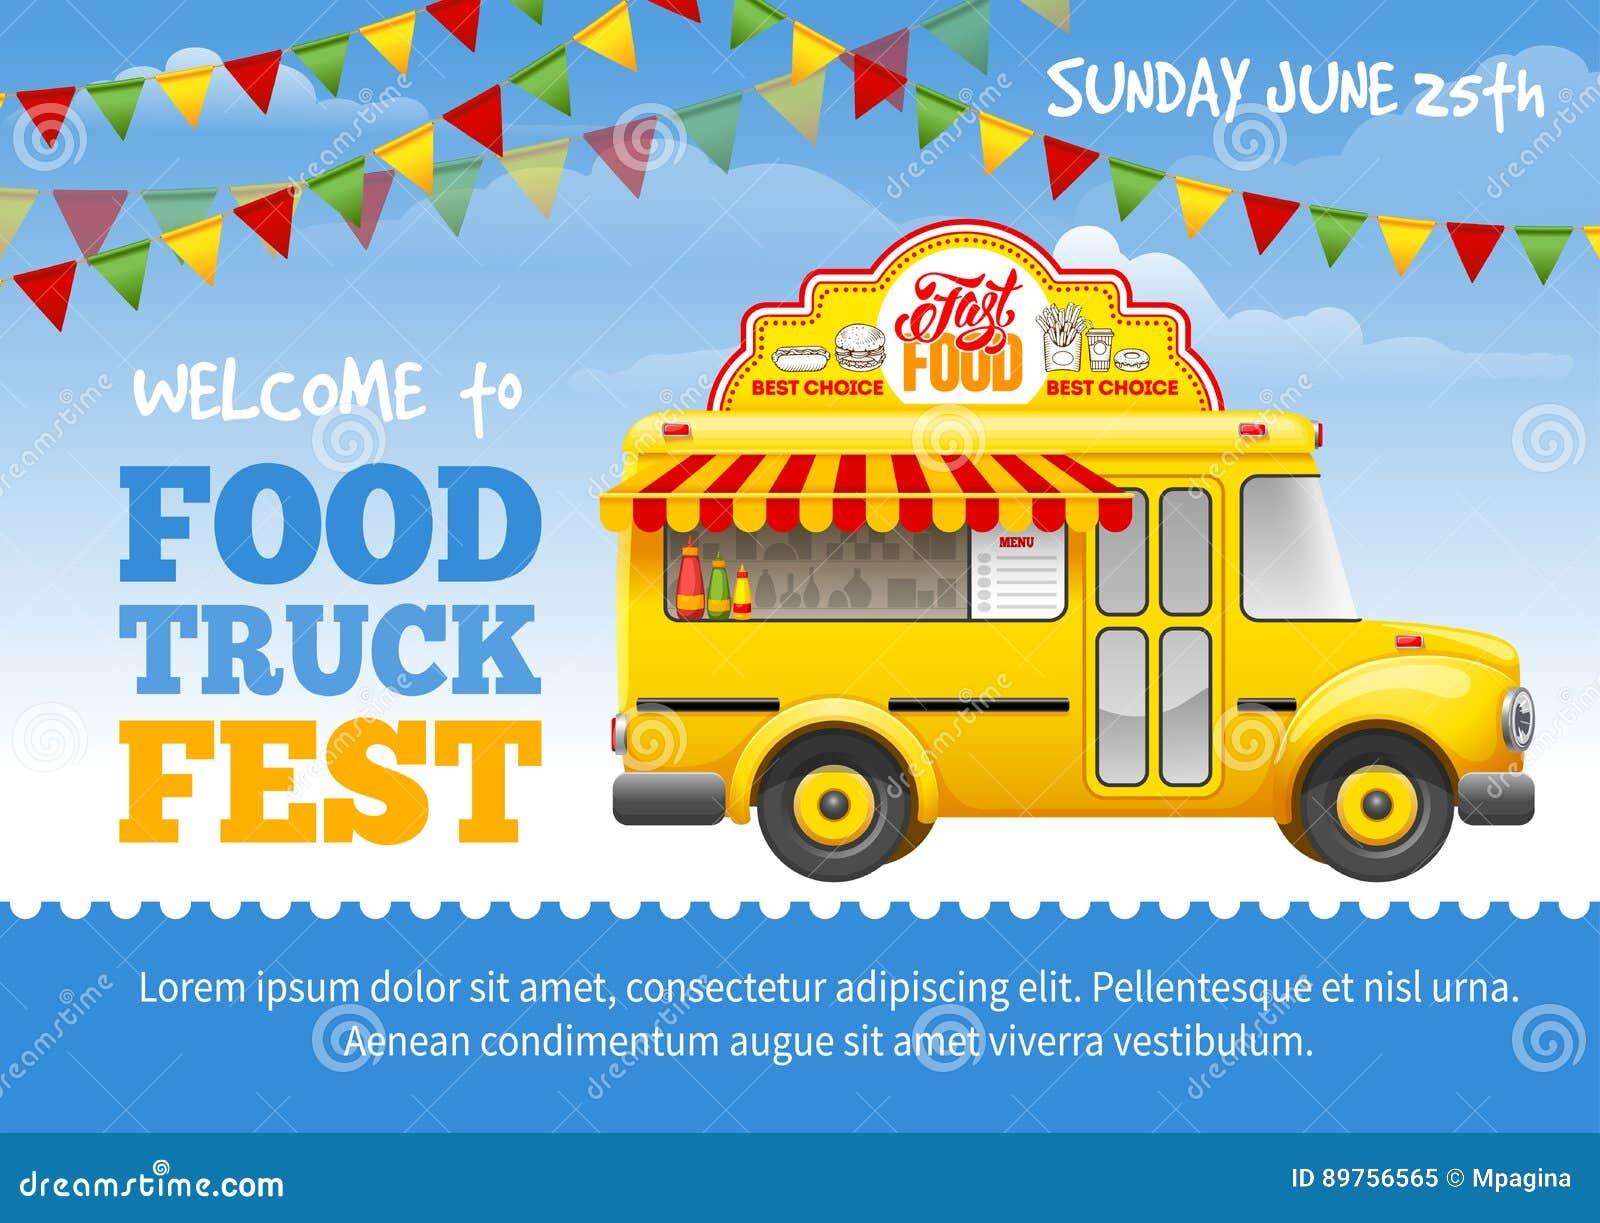 Food Truck Festival Poster Stock Vector Illustration Of